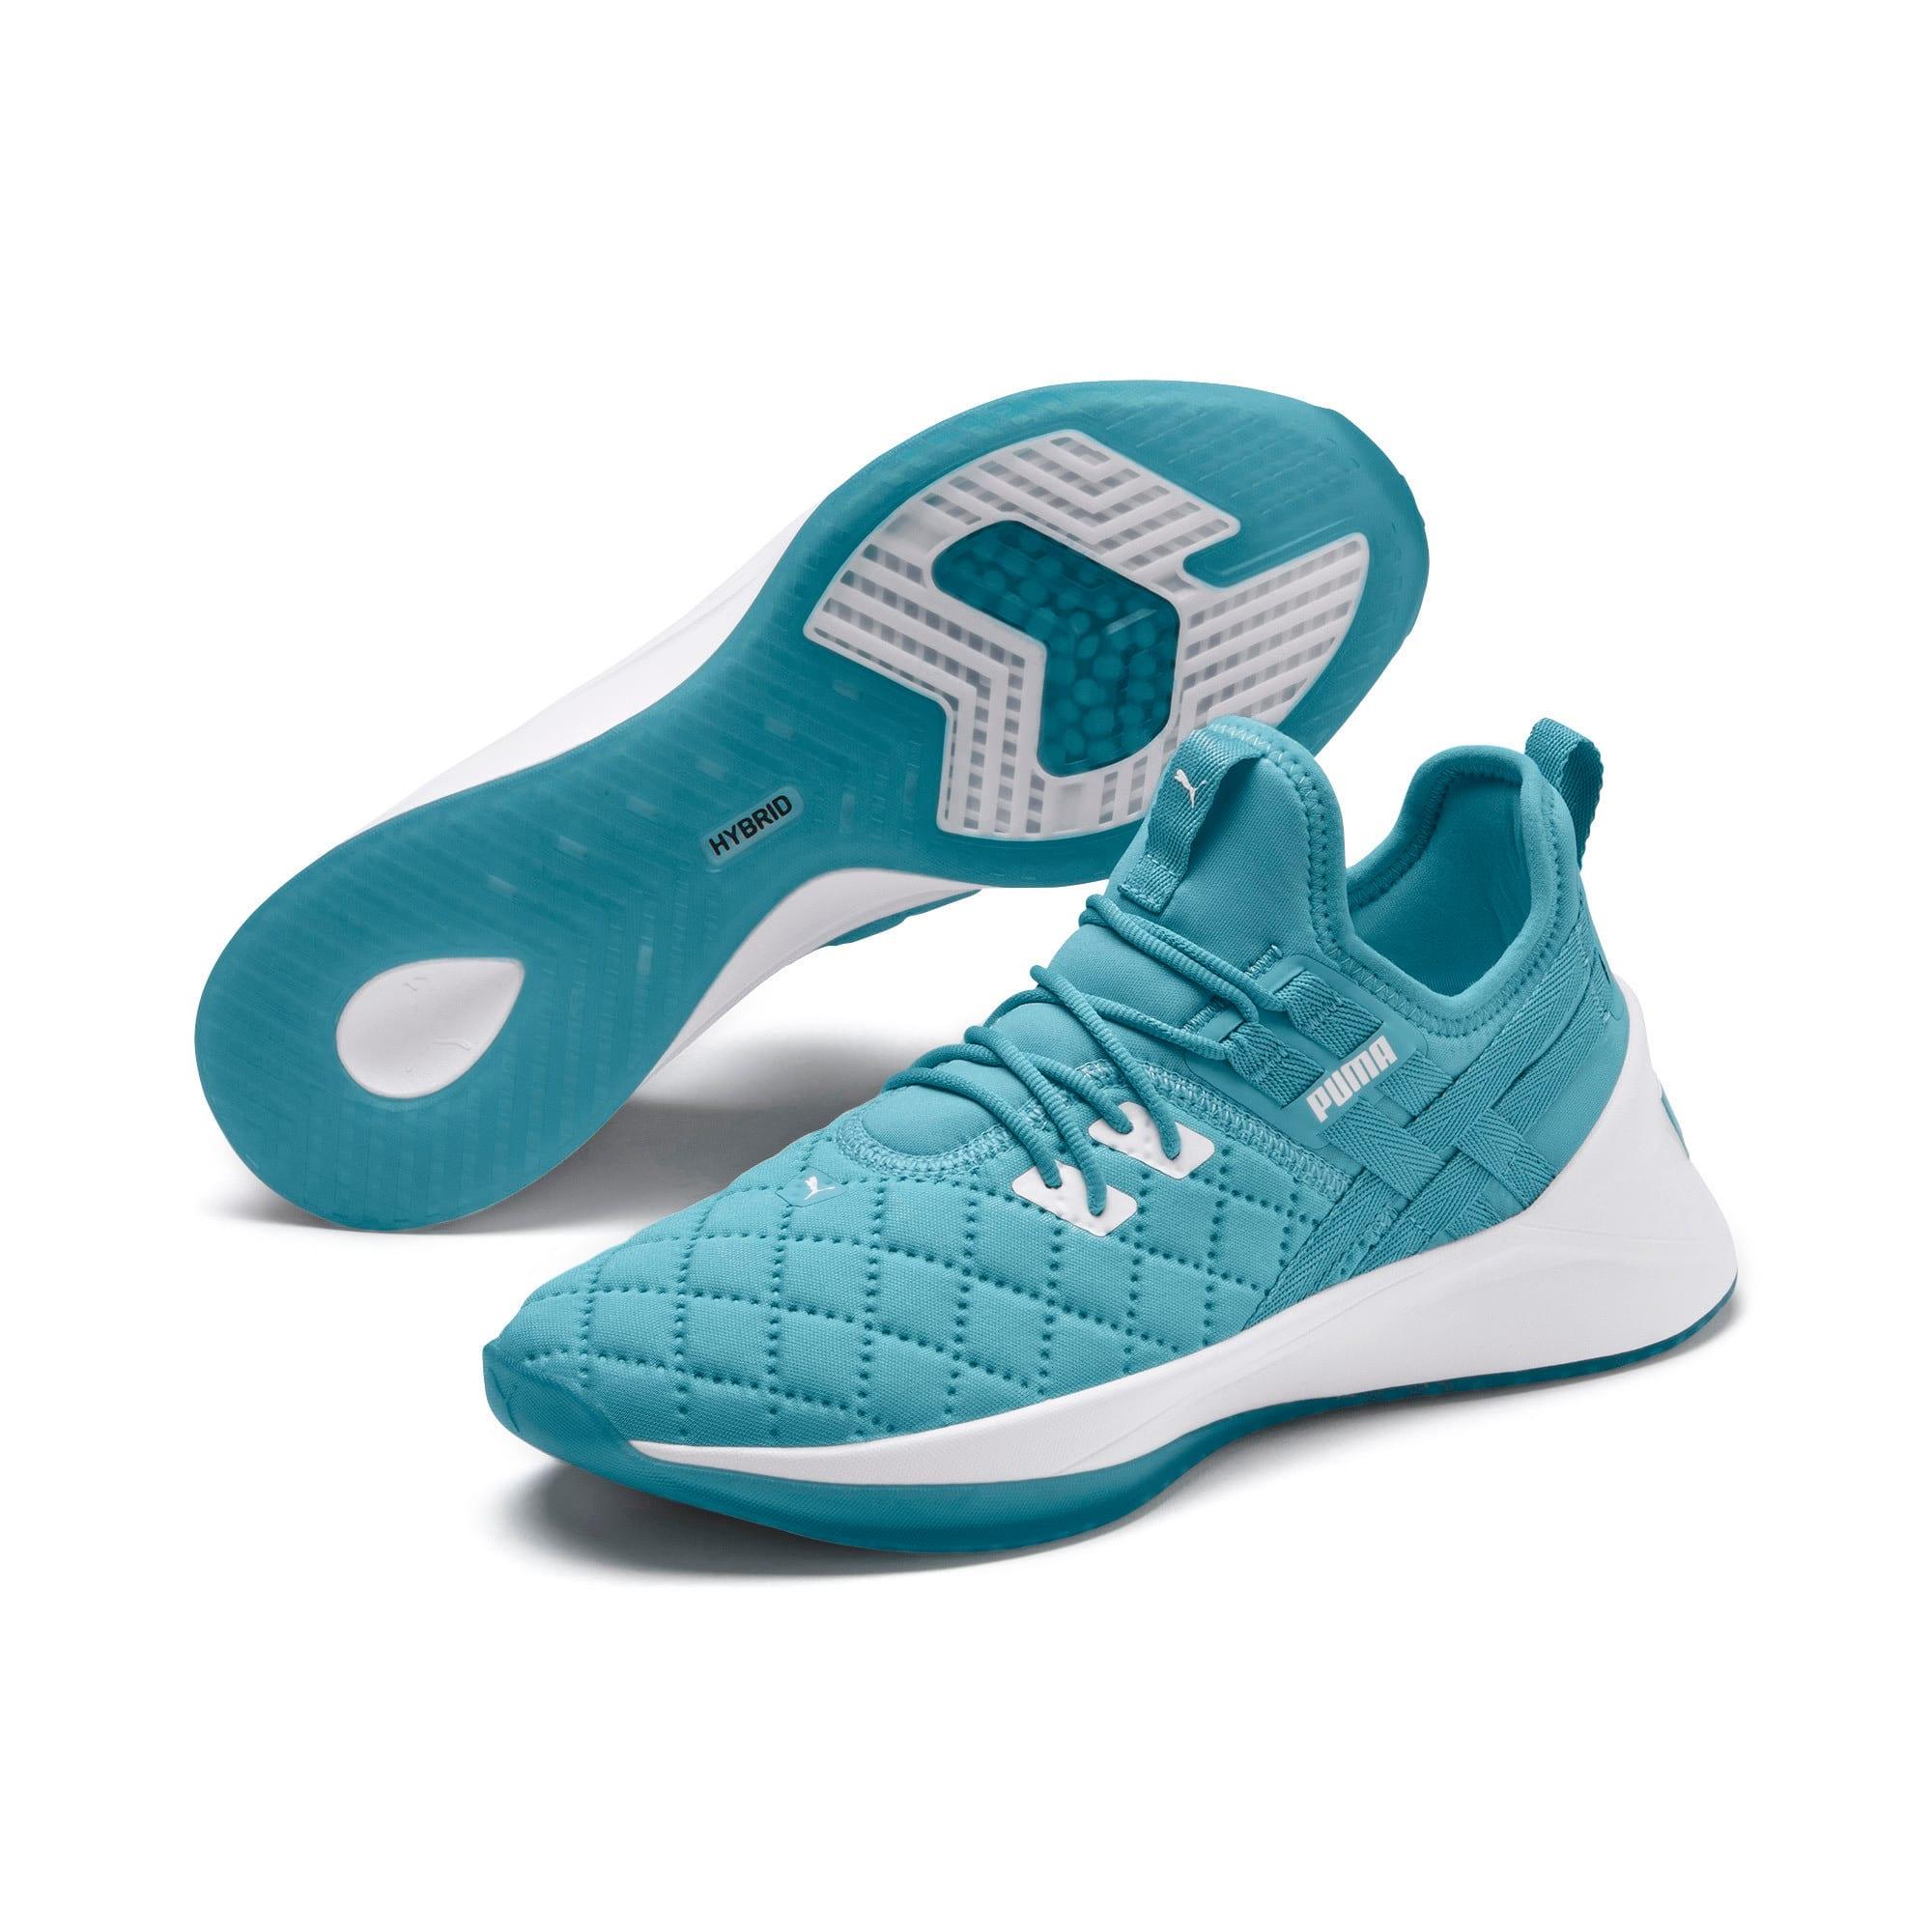 Thumbnail 2 of Jaab XT Quilt Women's Training Shoes, Milky Blue-Puma White, medium